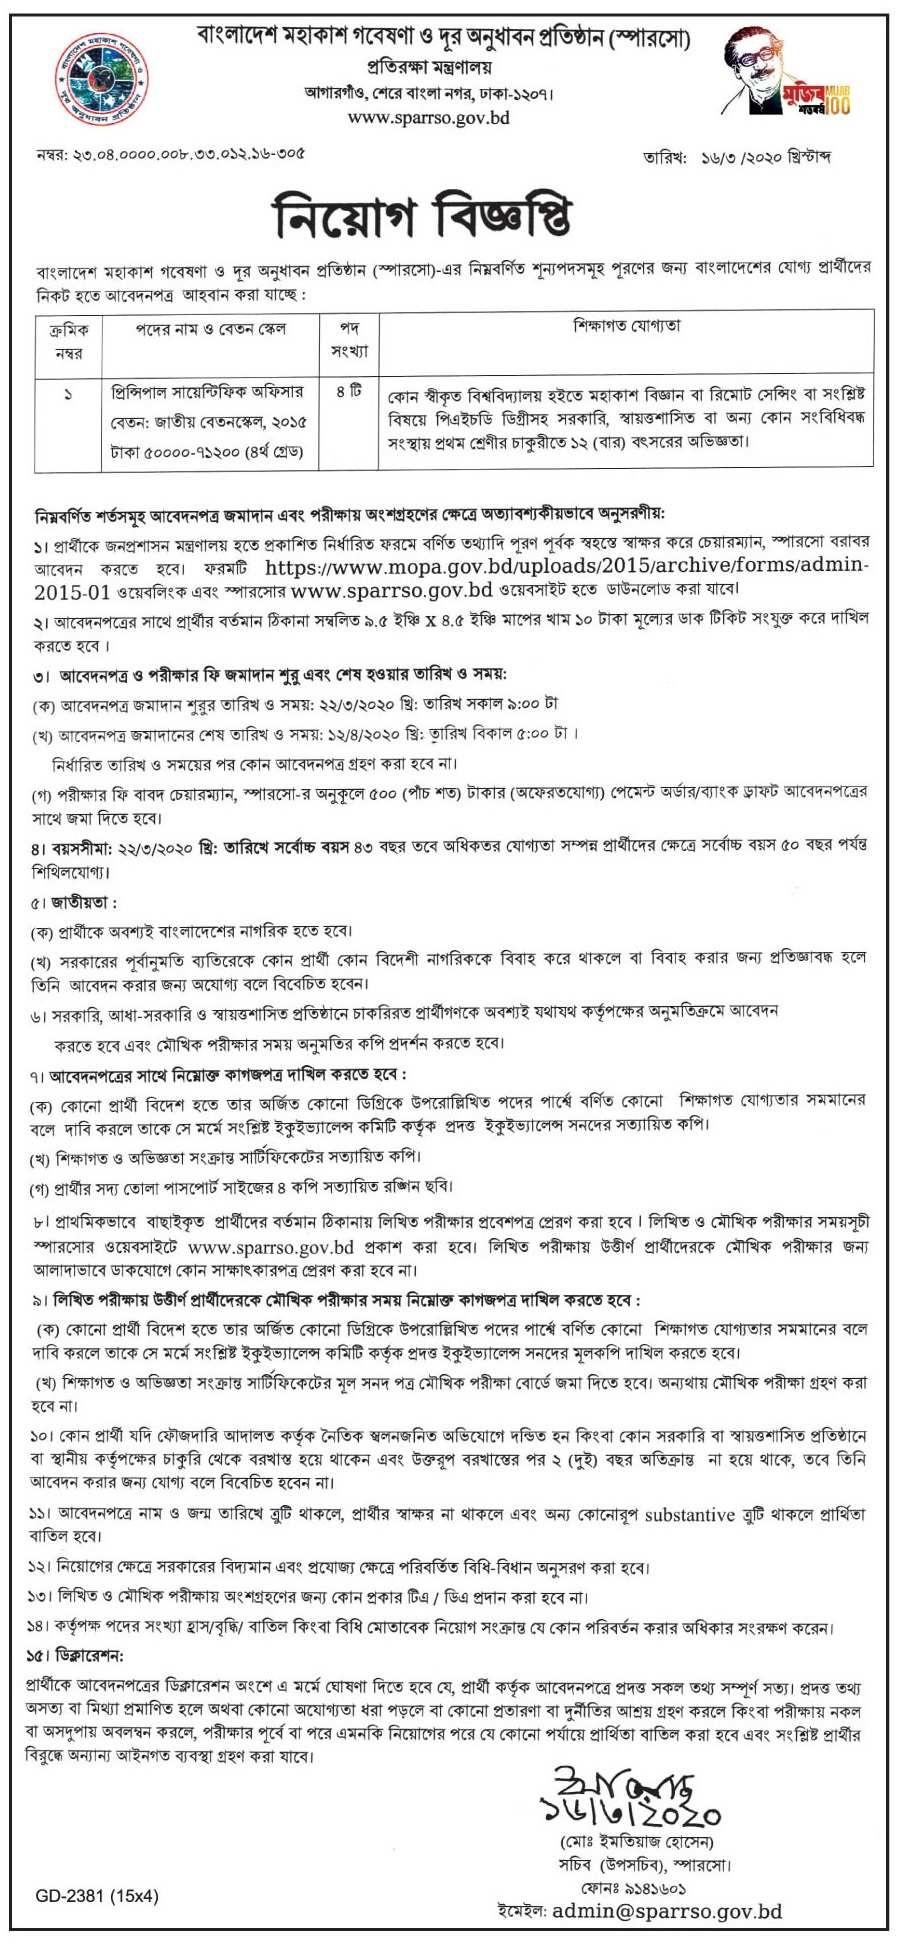 Ministry of Defence (MoD) Job Circular 2020